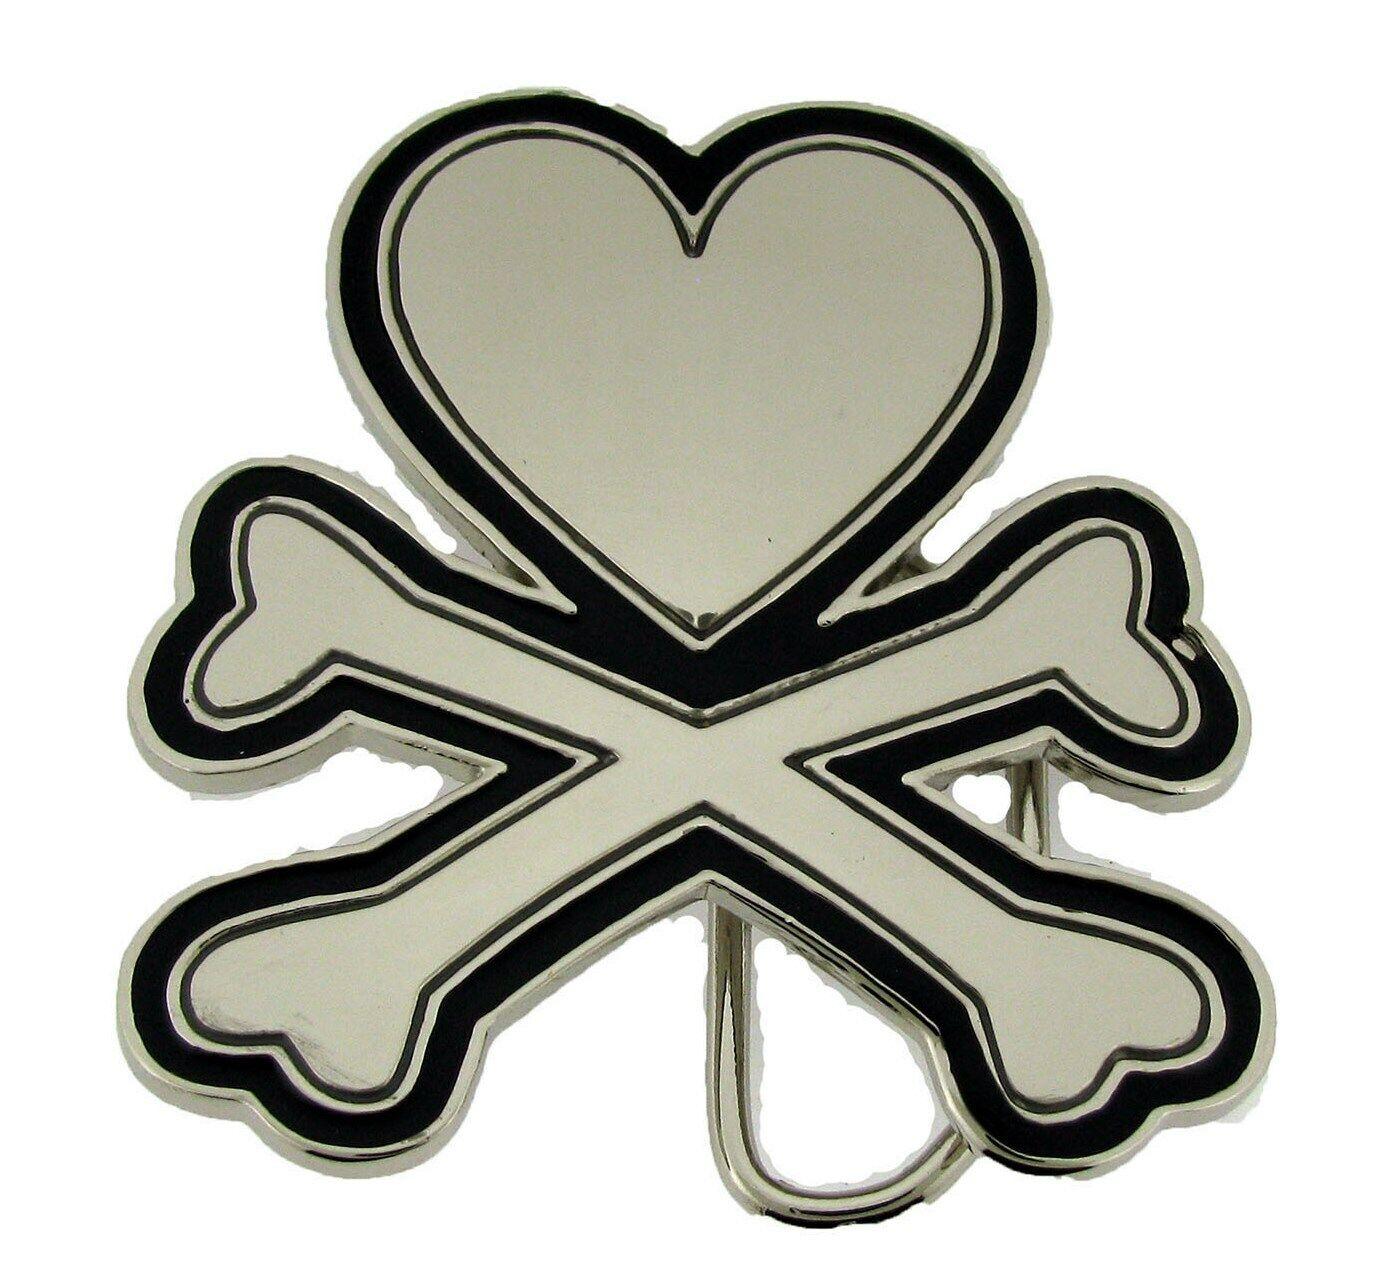 Heart Crossed Bones Belt Buckle Tattoo Gothic Silver Chrome Men Women Fashion